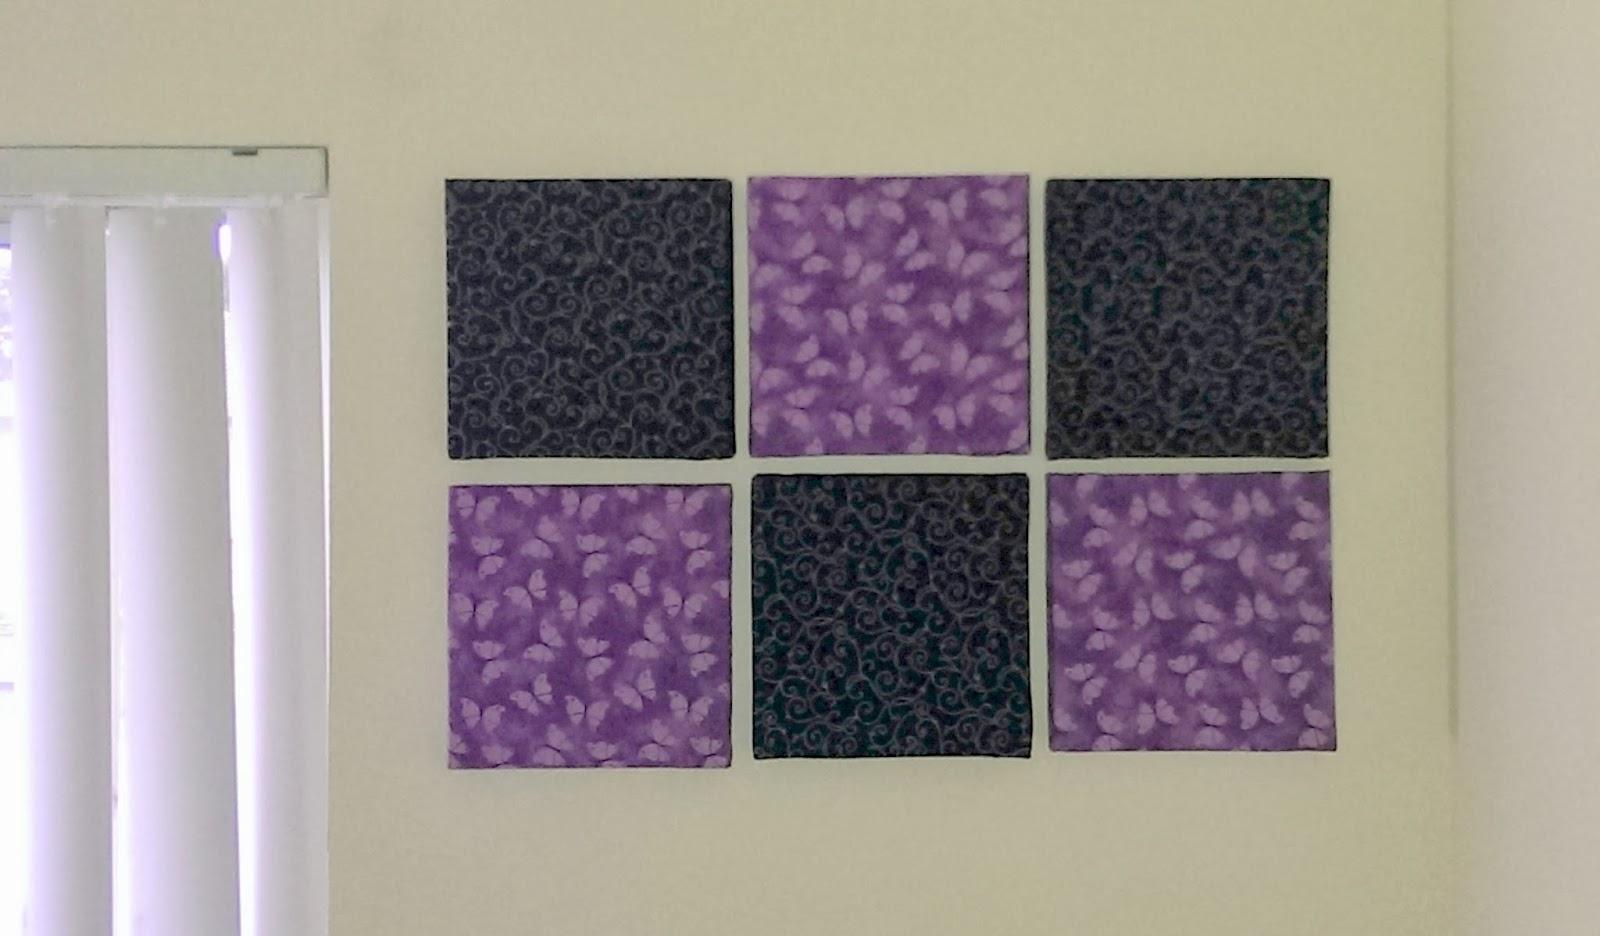 Diy Addiction: Wall Art – Fabric Covered Canvas Within 2018 Diy Fabric Canvas Wall Art (View 7 of 15)